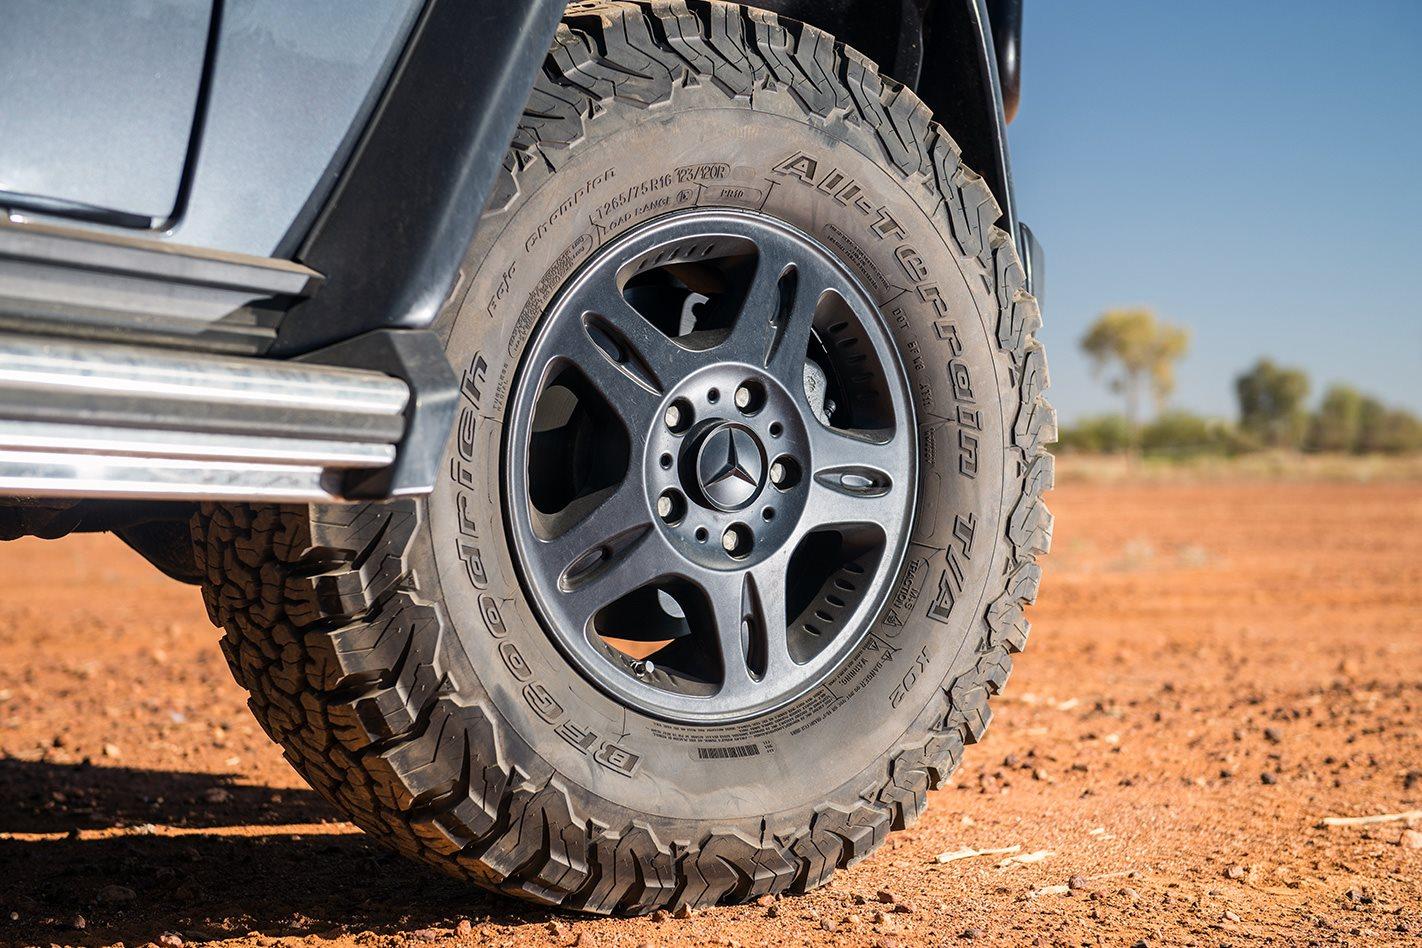 2018 Mercedes Benz G300 CDI Professional wagon wheel